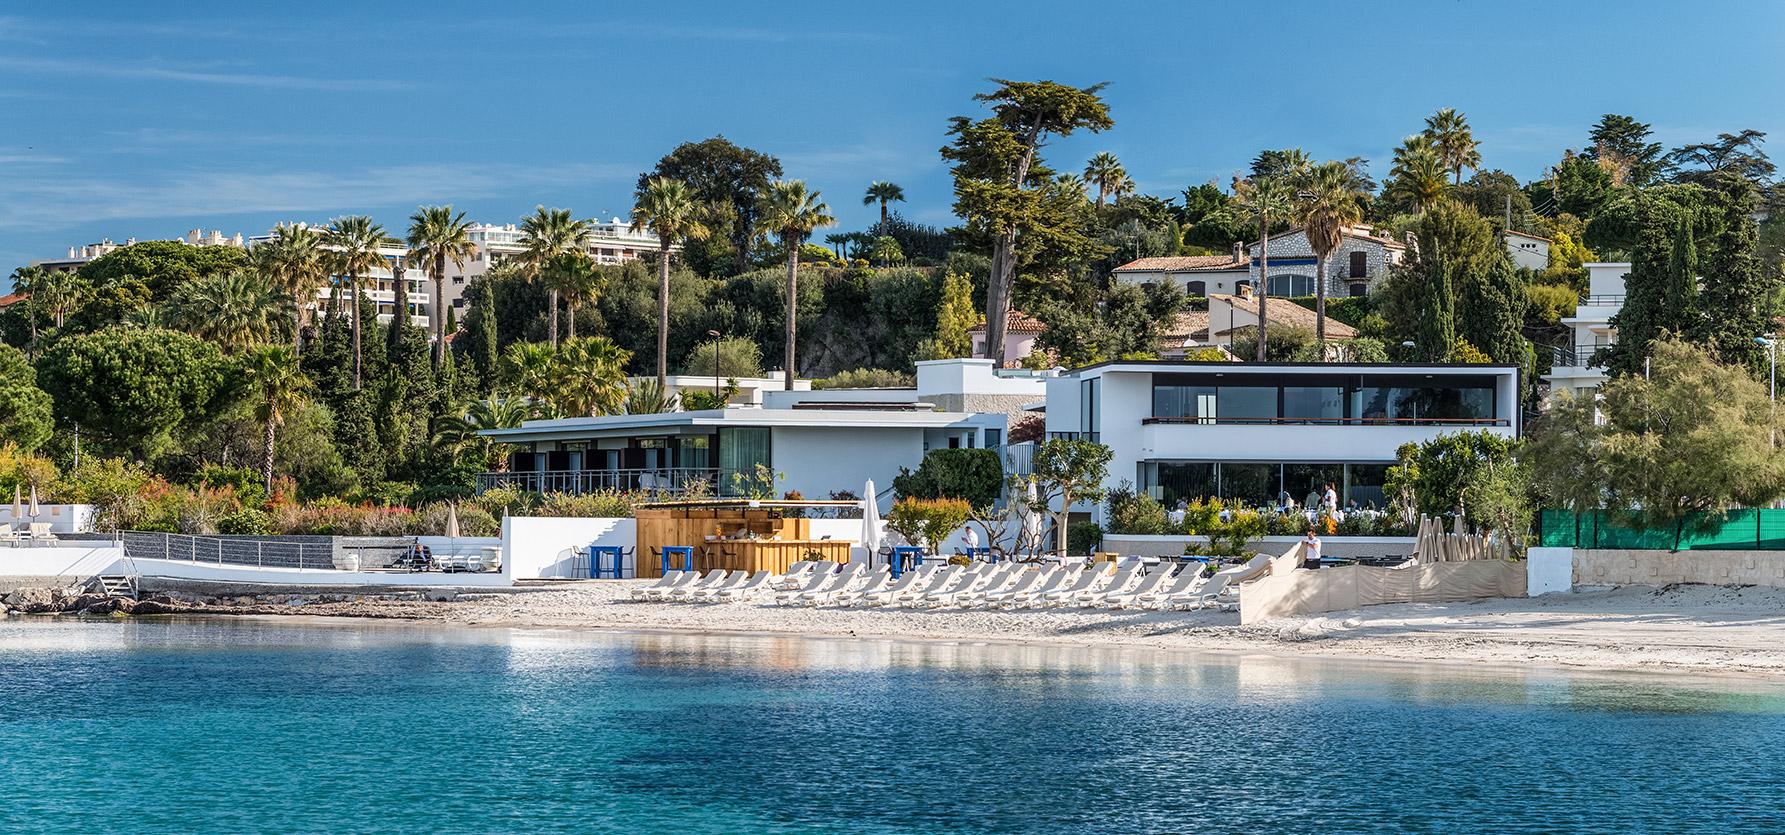 Royal Antibe Hotel